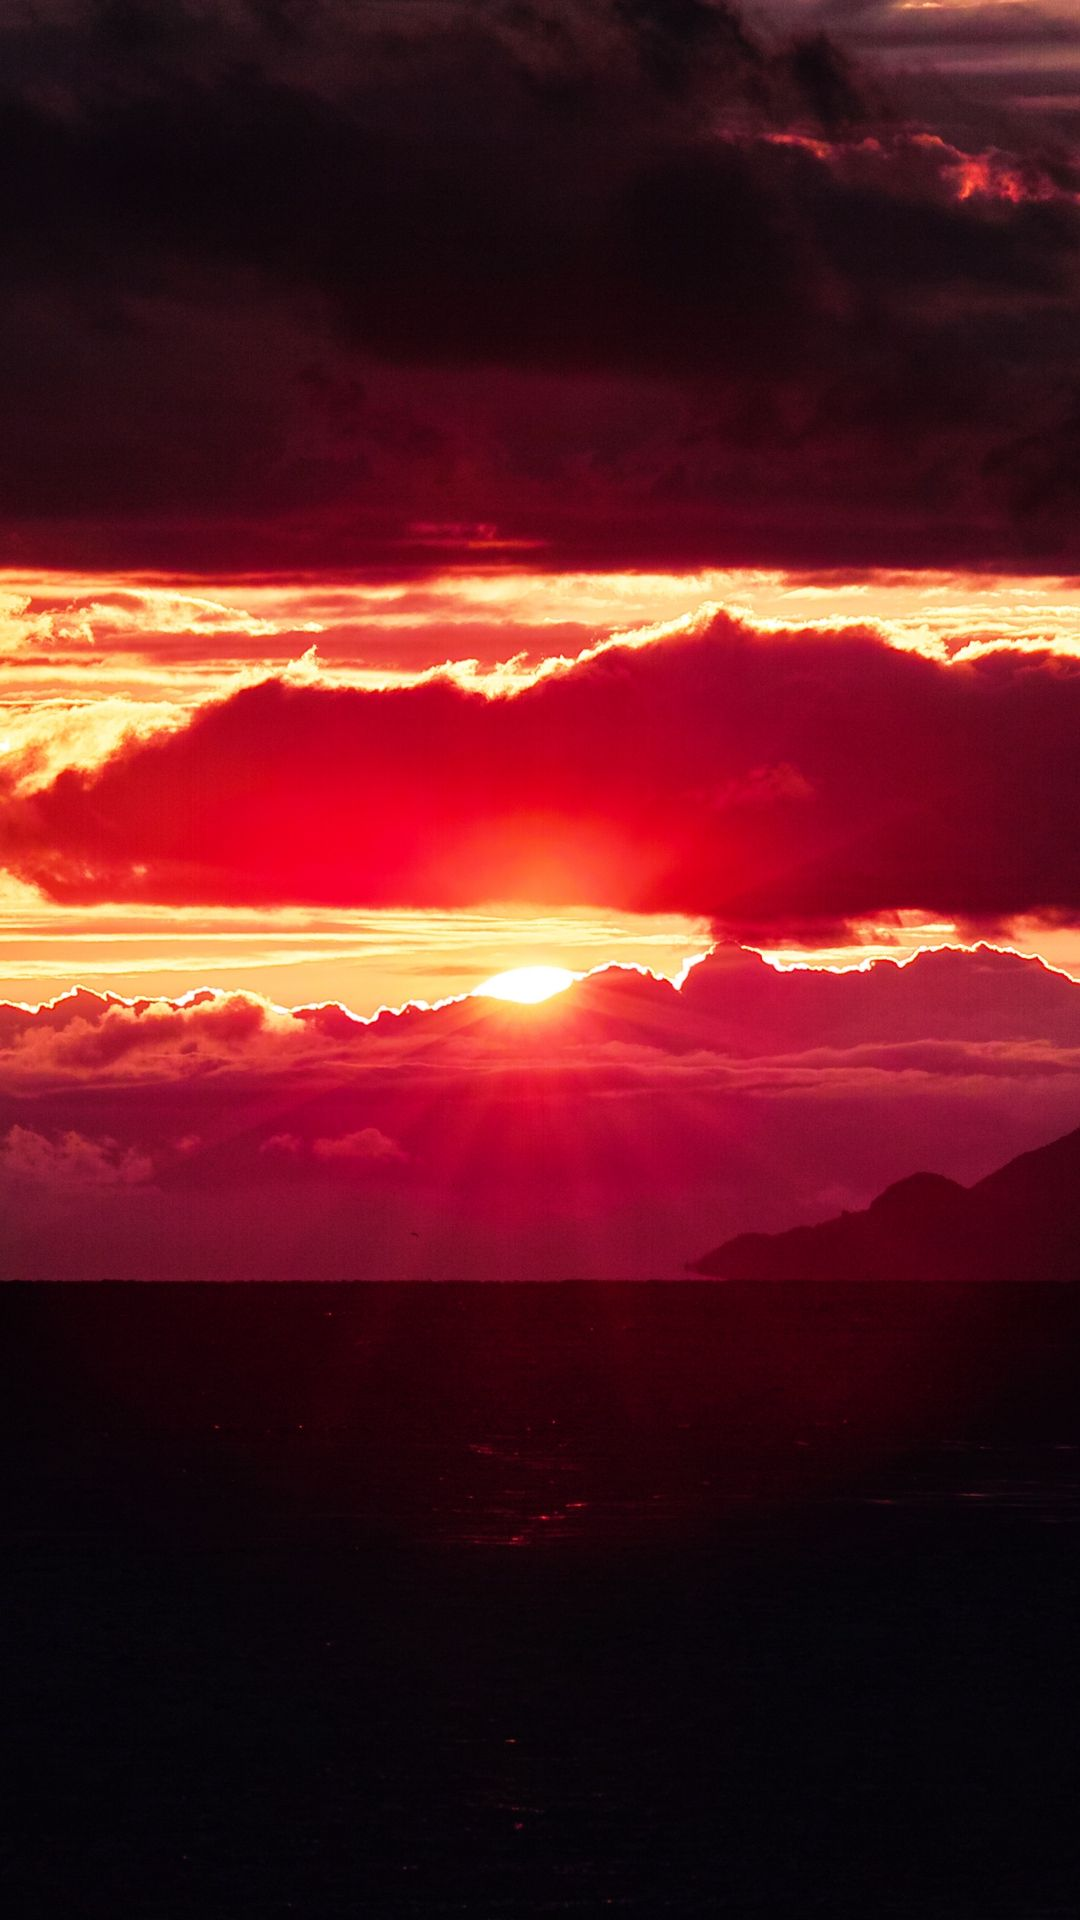 MuchaTseBle 4k background, Sunset